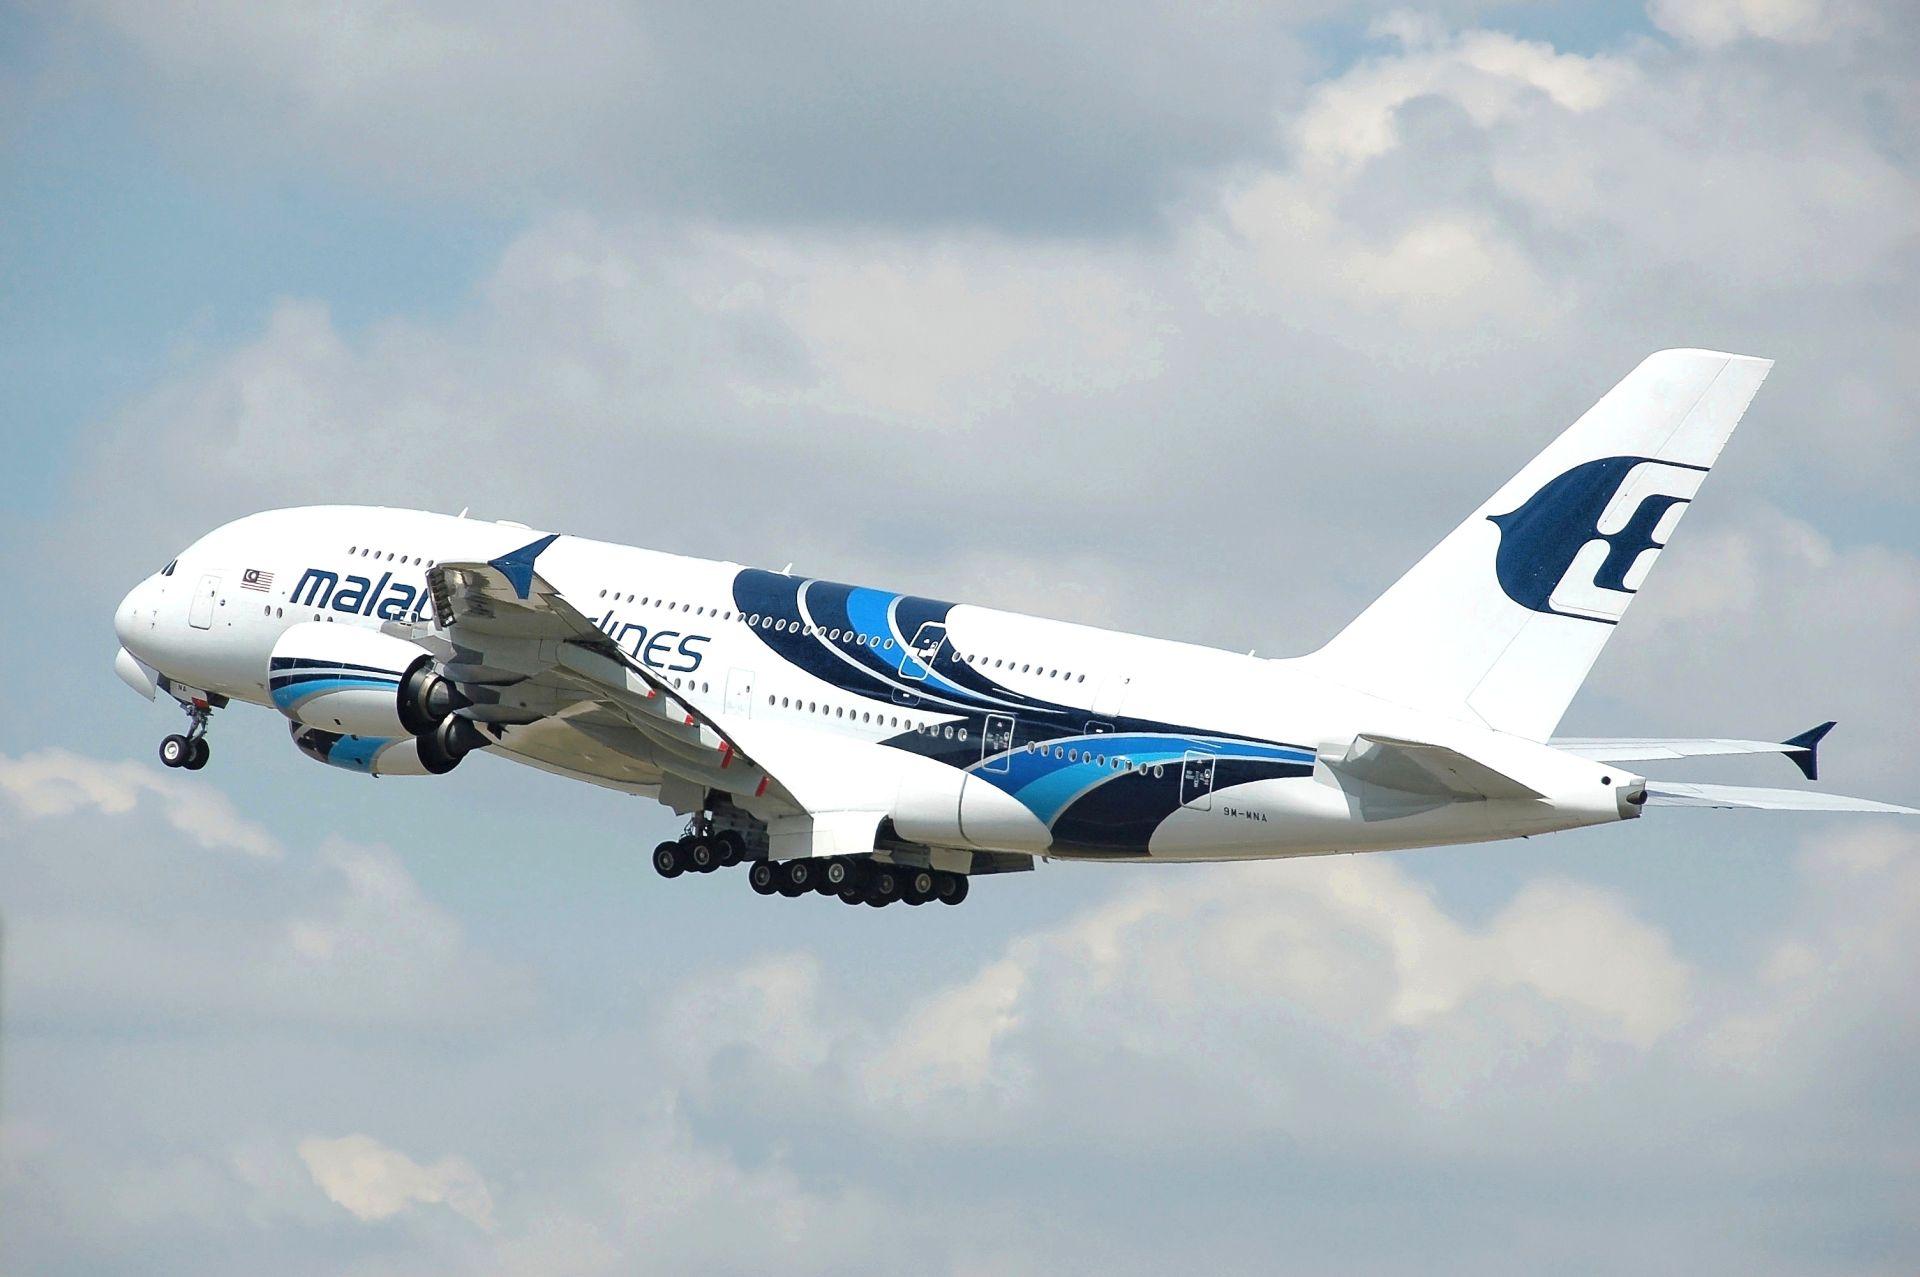 Airbus A380 společnosti Malaysia Airlines. Foto: Adrian Pingstone / Wikimedia Commons